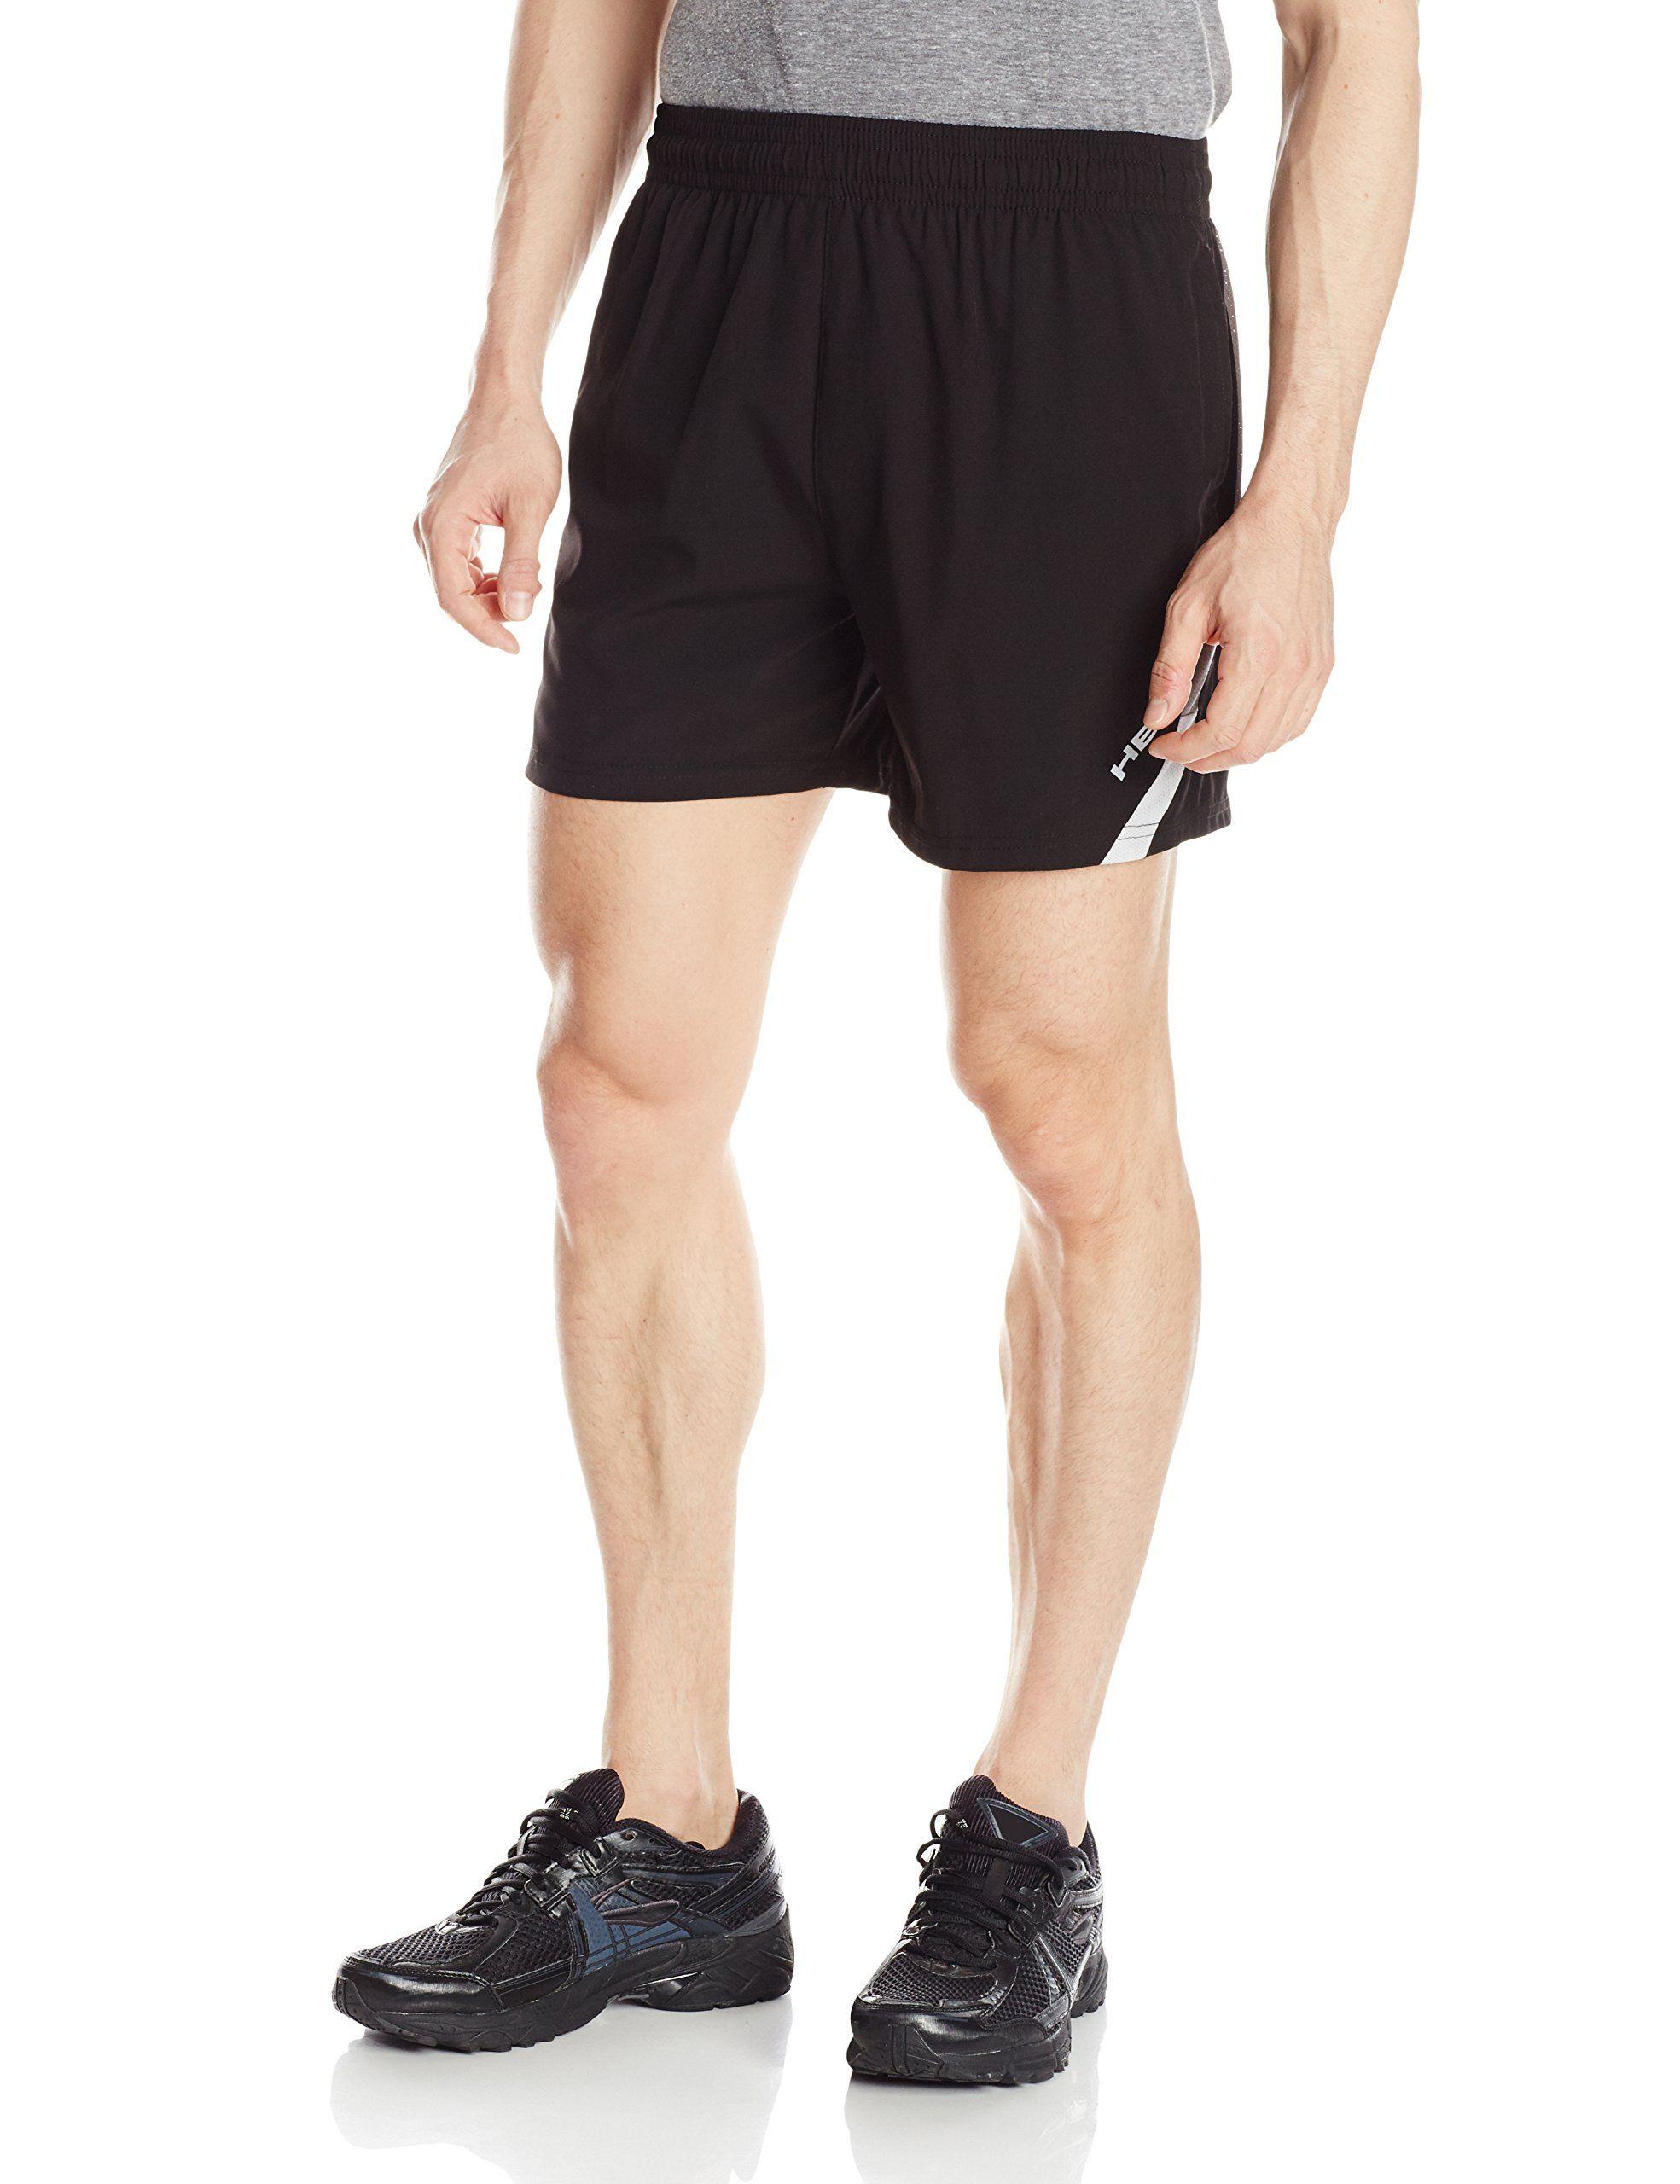 5 inch shorts